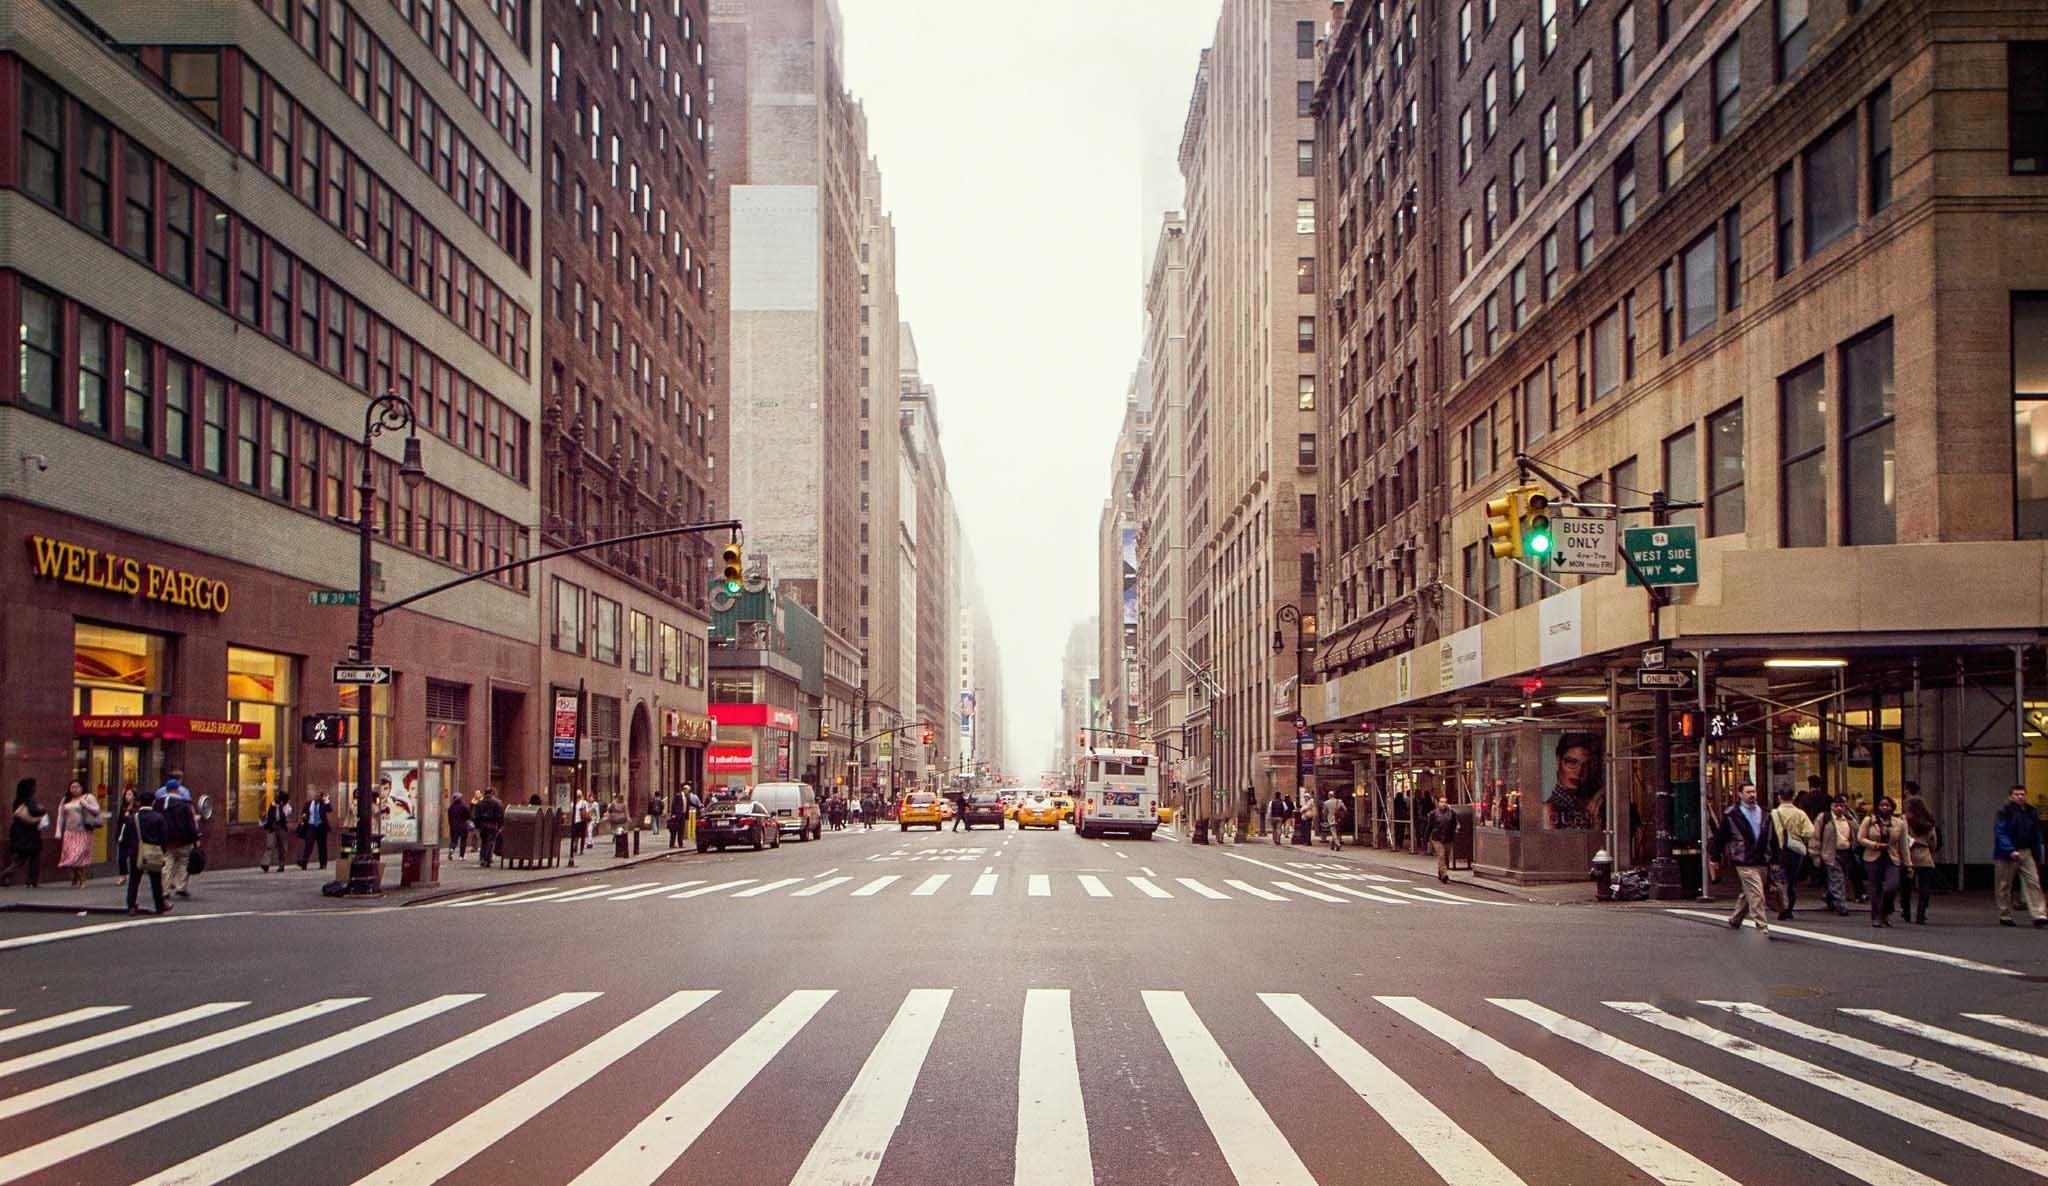 new-york-city-road-zebra-crossing-street-photo-wallpaper. Â«Â«